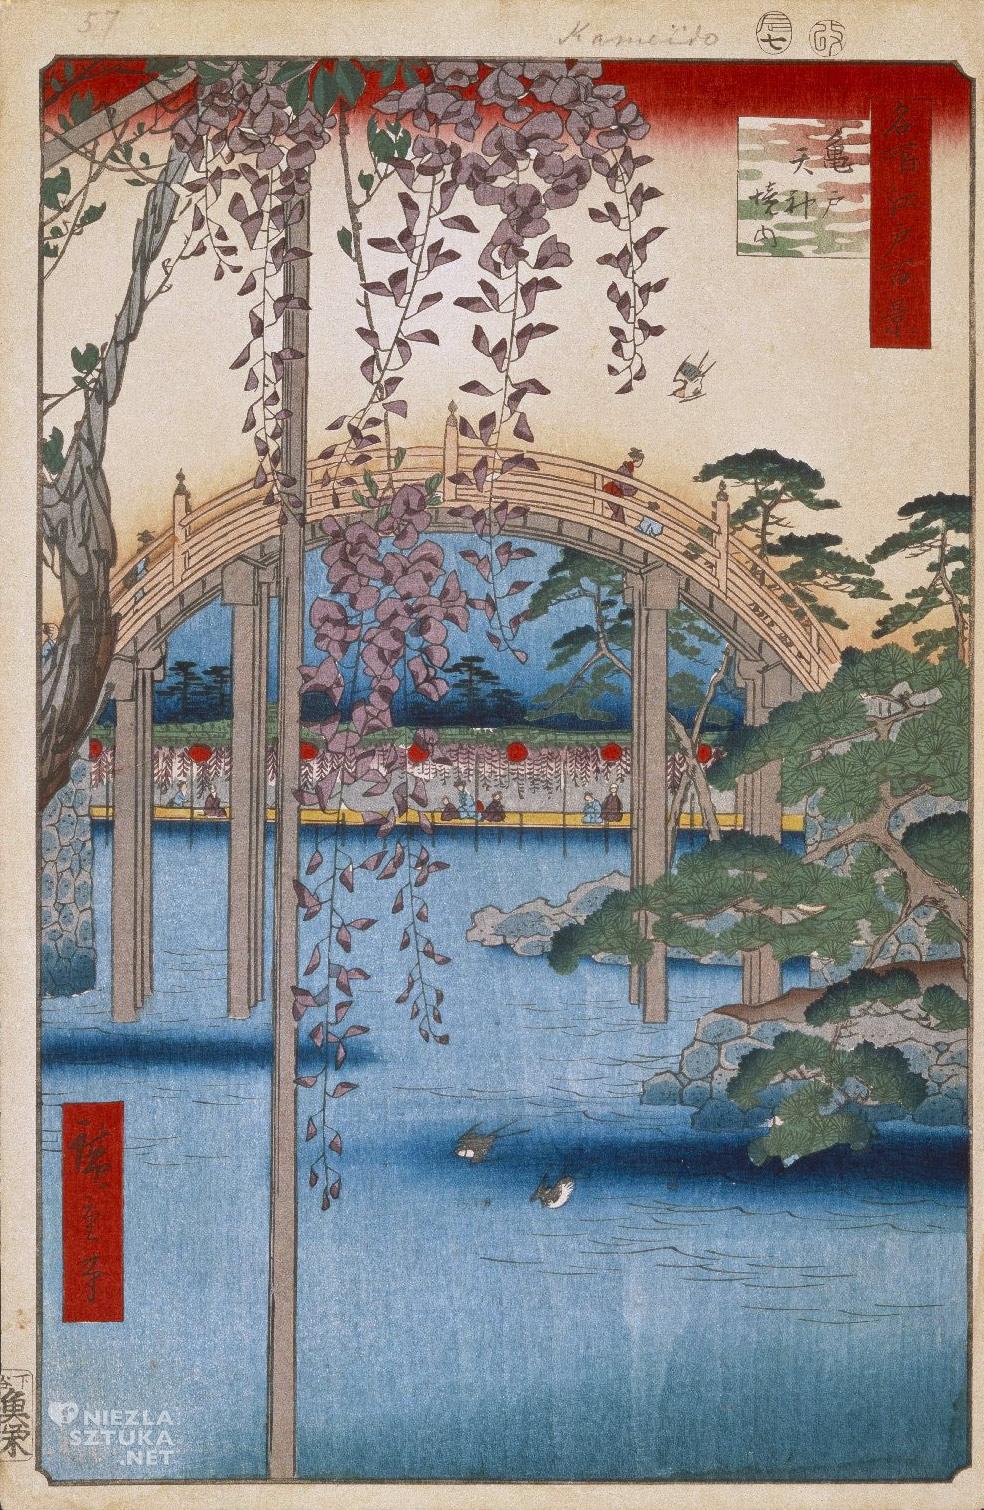 Utagawa Hiroshige <em>Inside Kameido Tenjin Shrine</em>, 1856, Brooklyn Museum